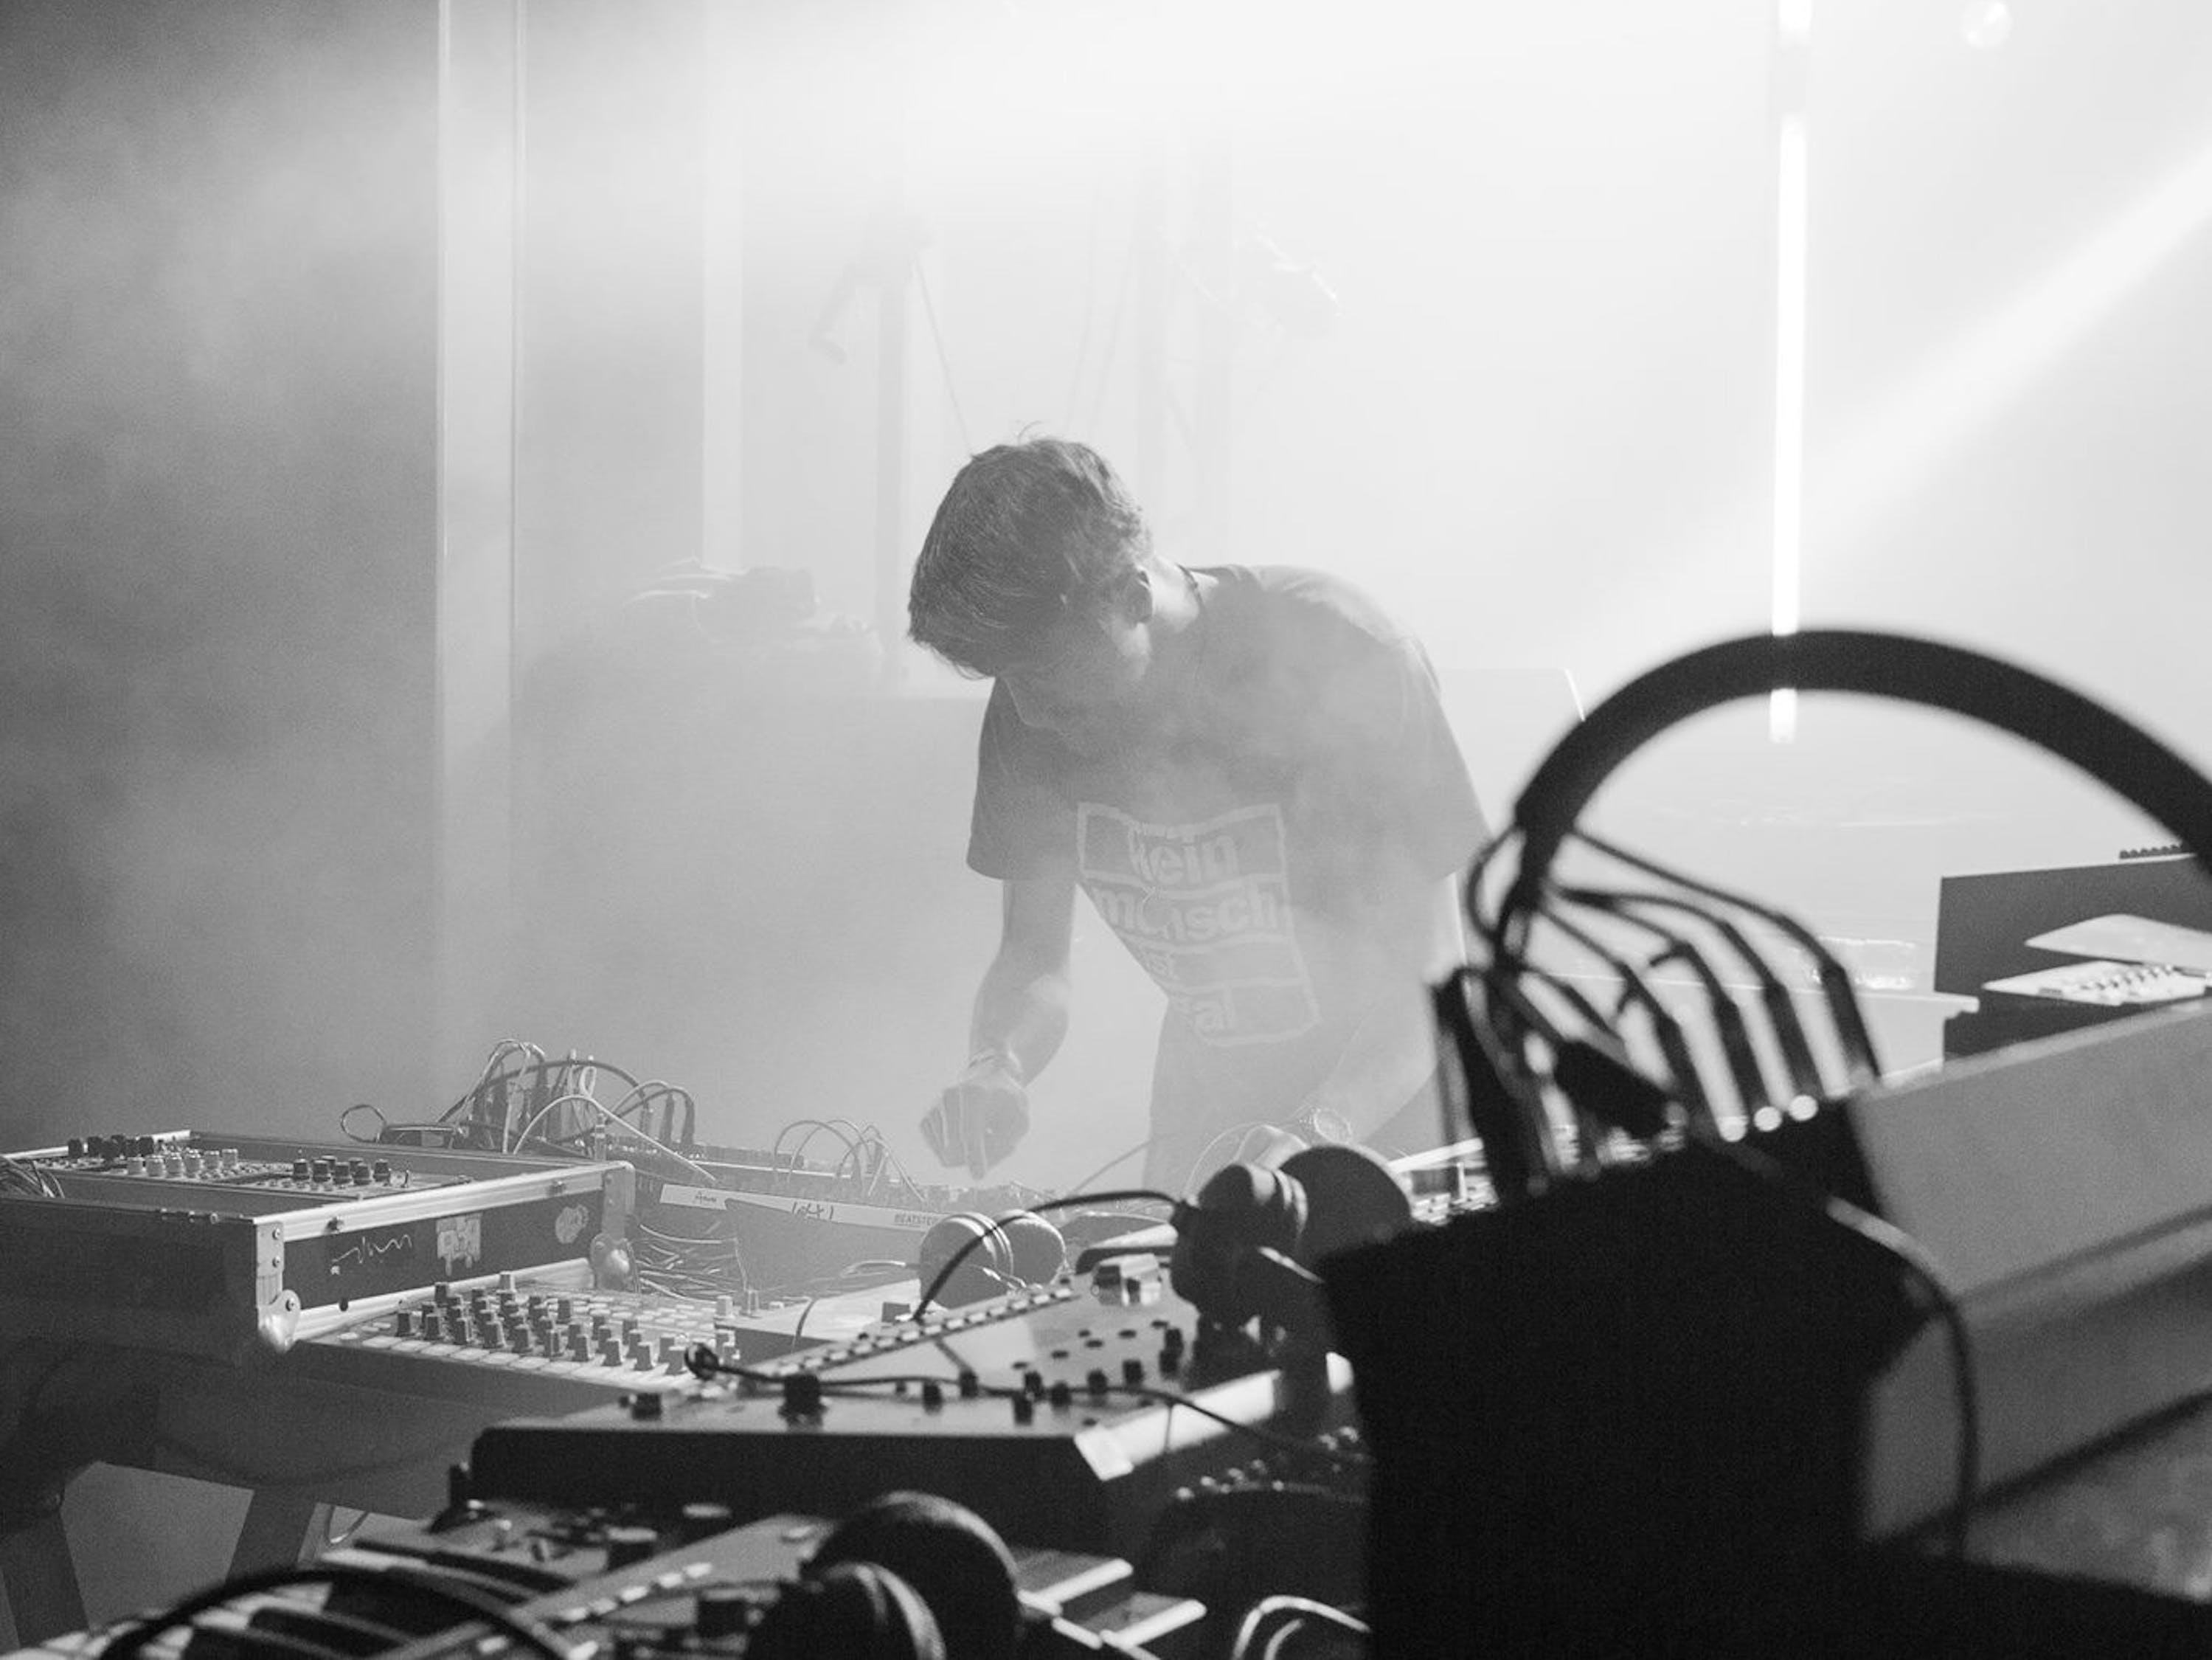 Tom Reger, Antilophobia | Catalyst Berlin Music student